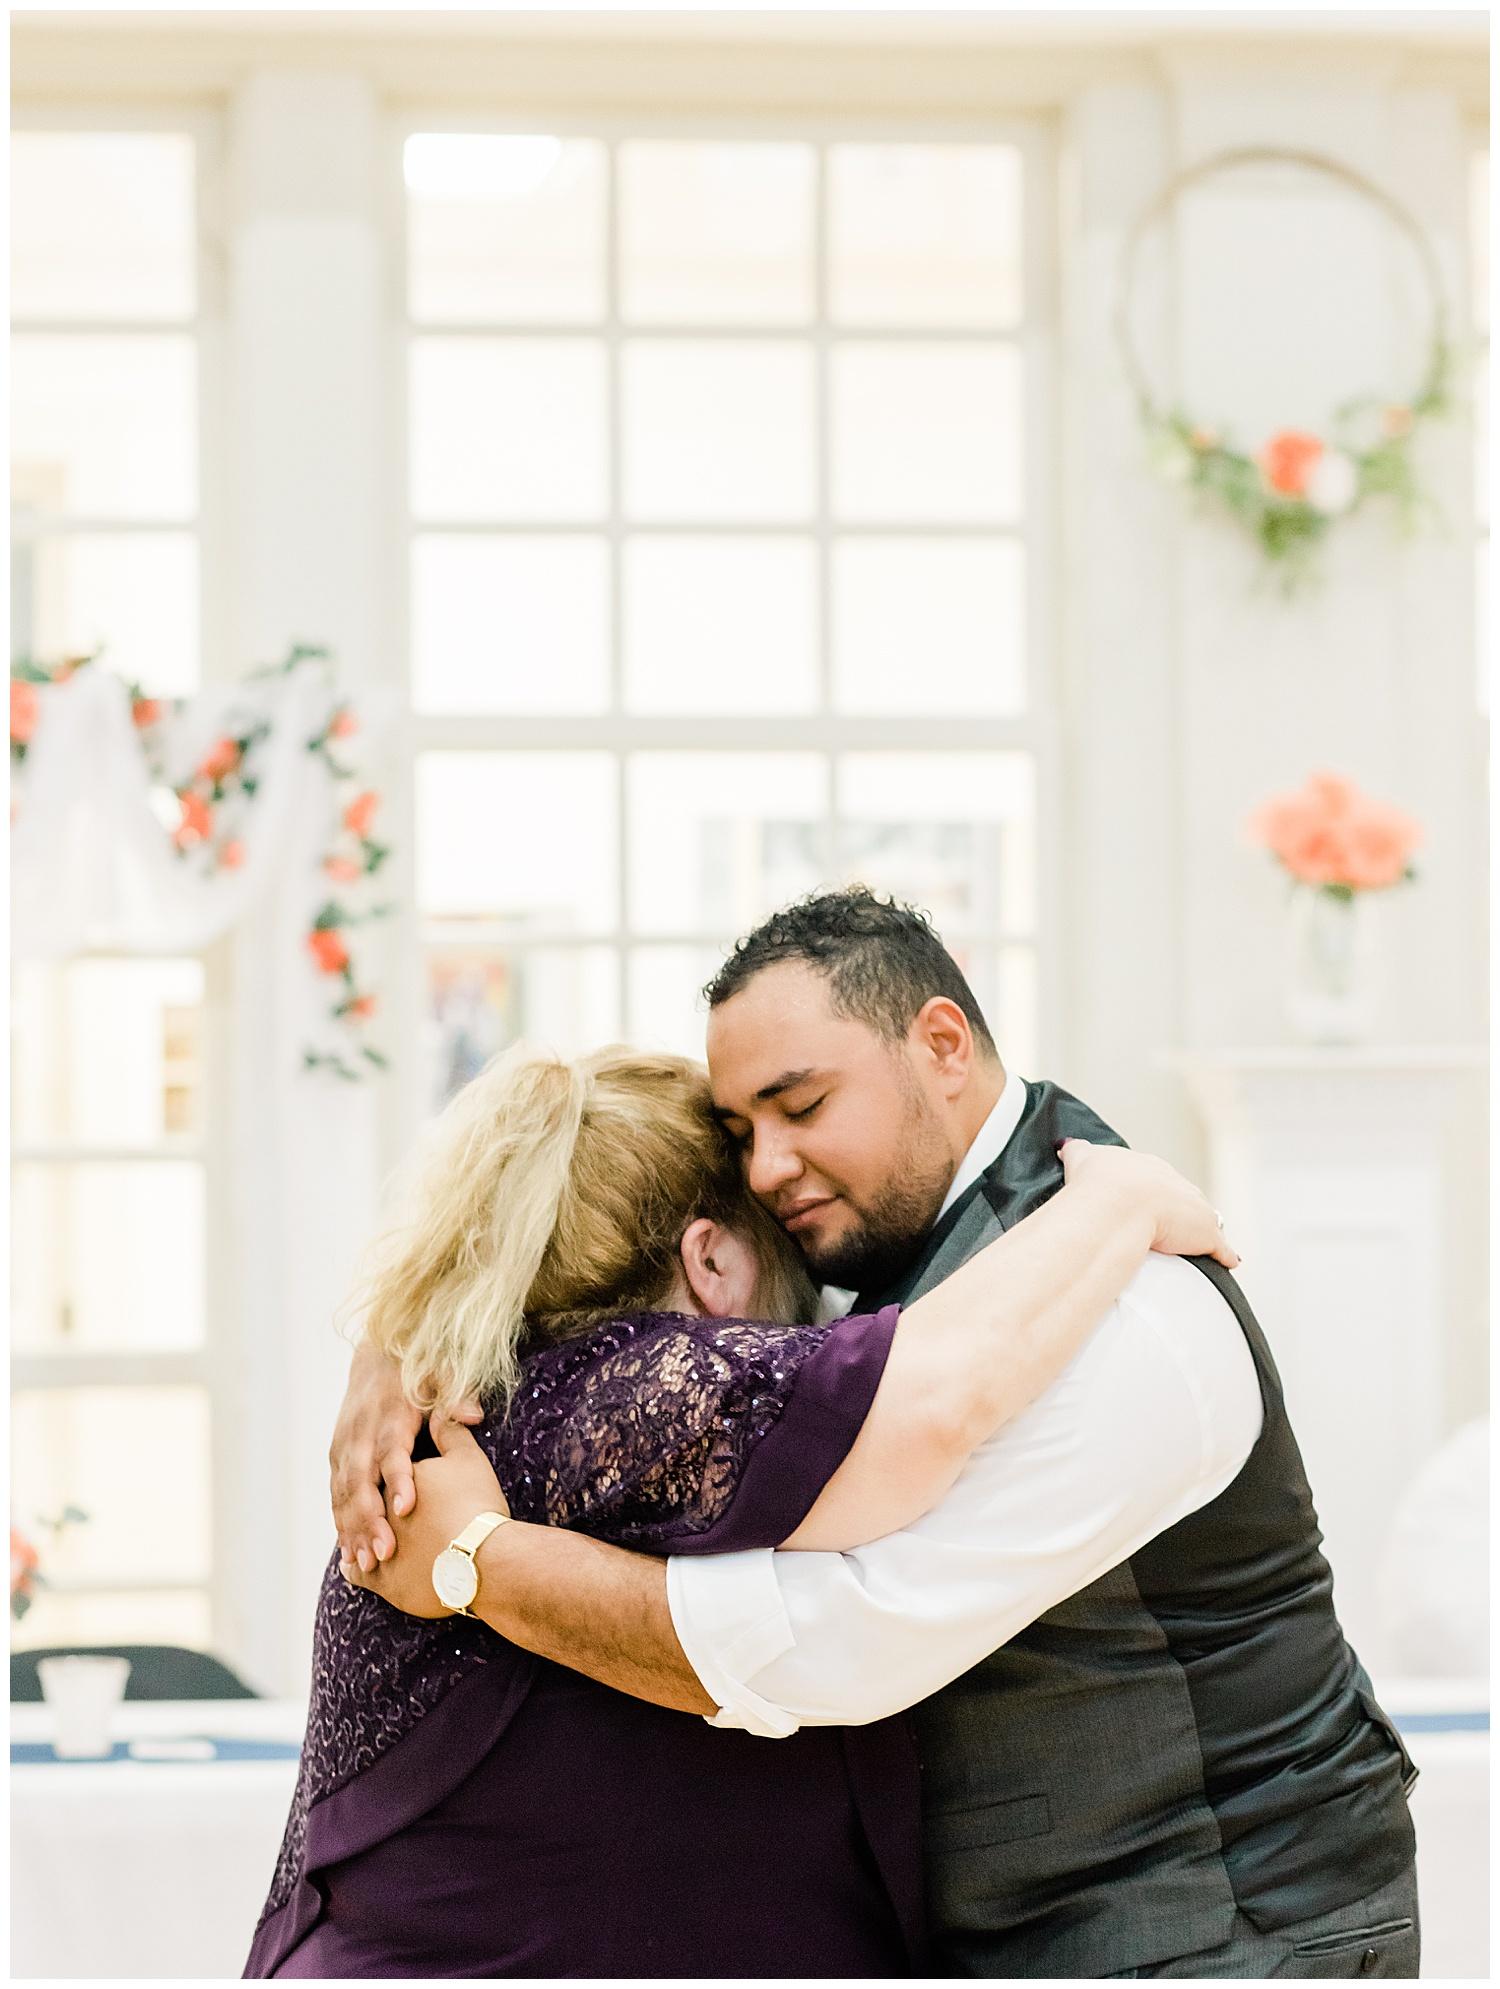 First Dance - Montpelier Center for the Arts - Virginia Wedding Photographer